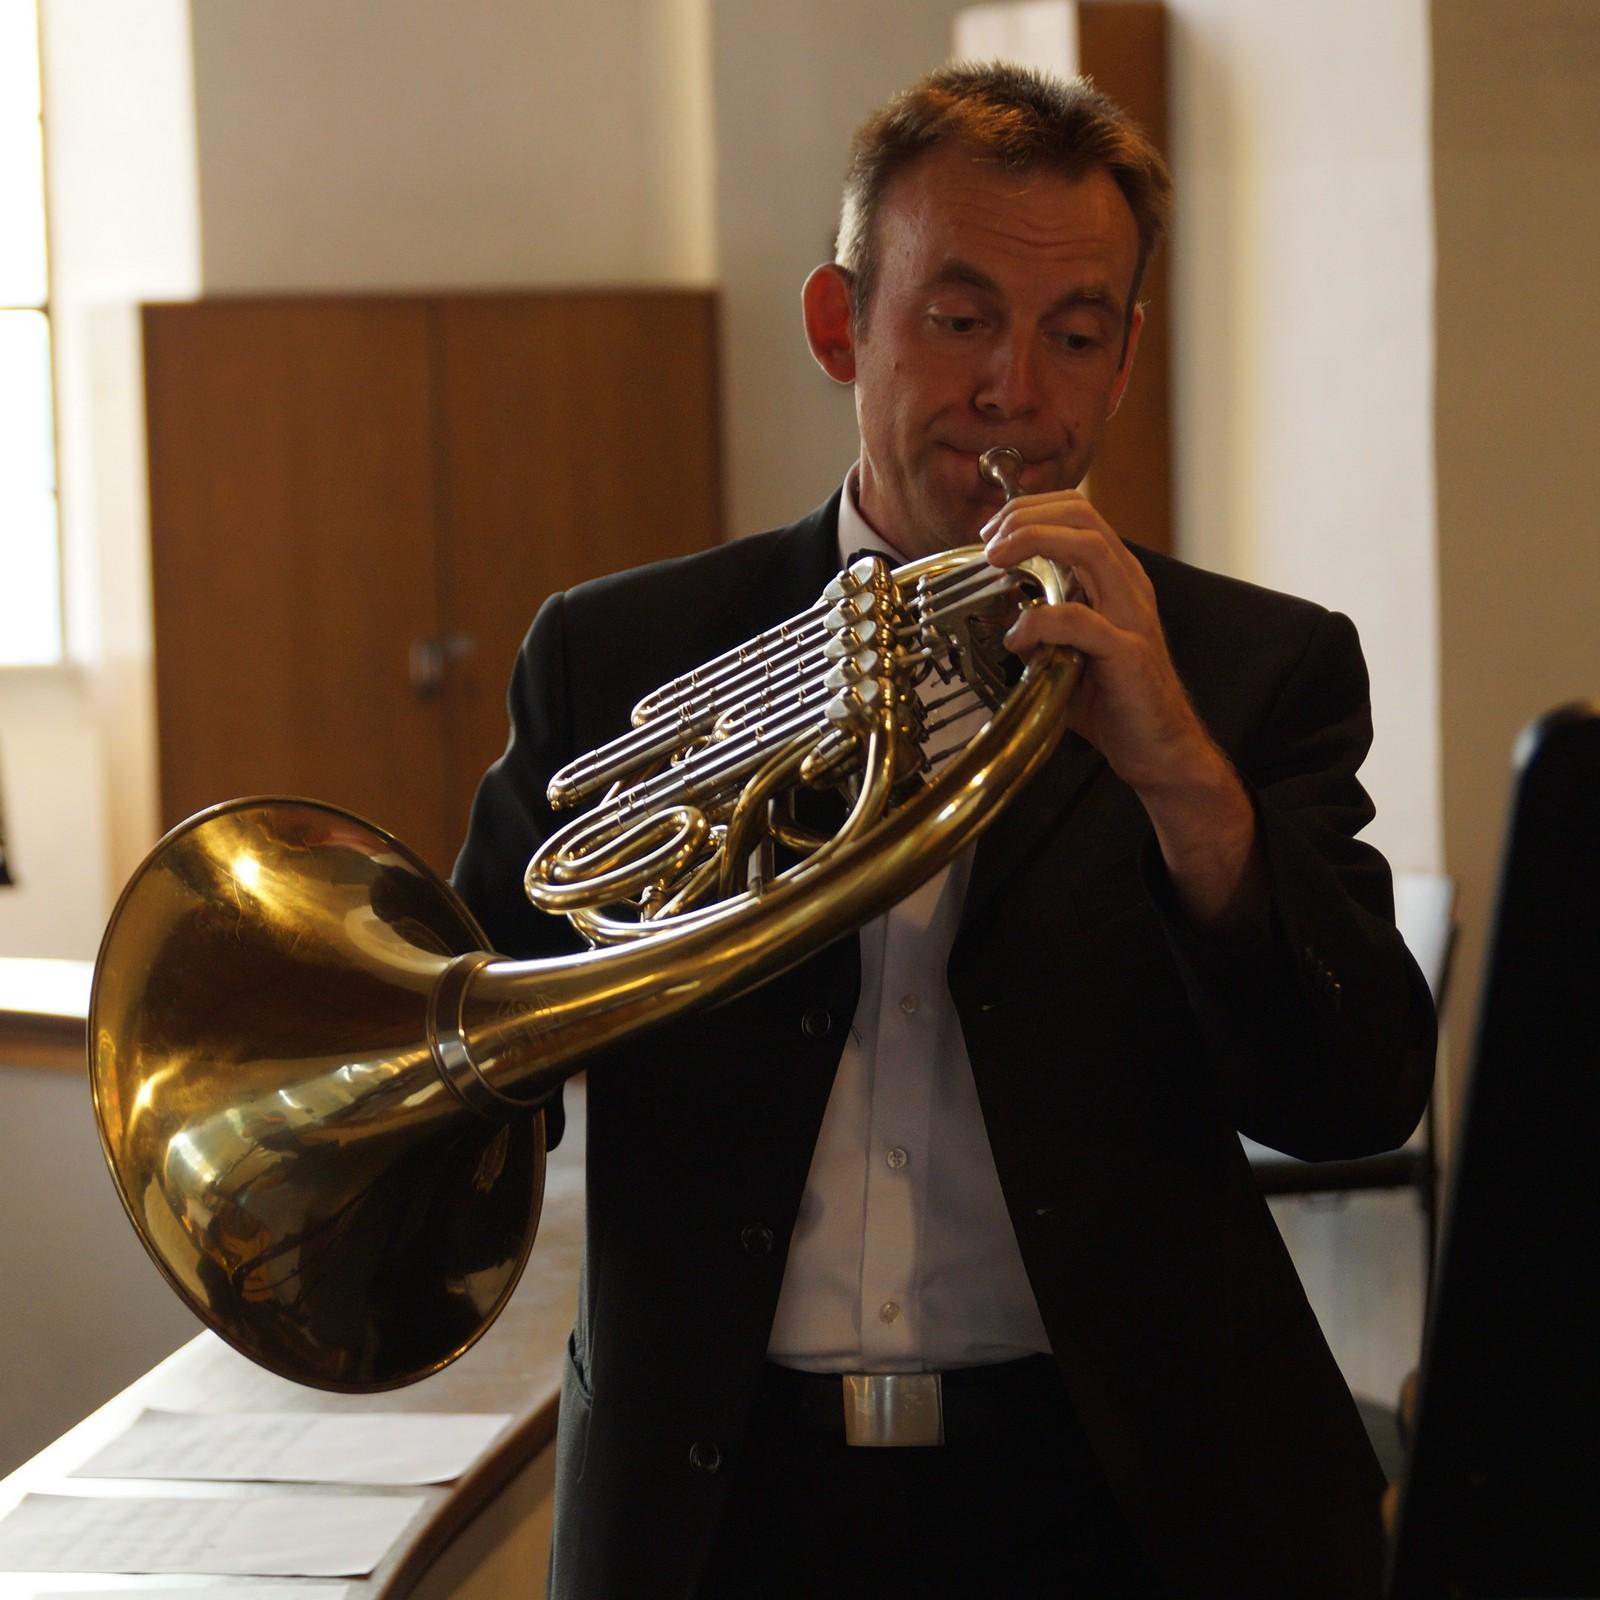 20180815-Konzert Patrozinium Maria Himmelfahrt DSC02563